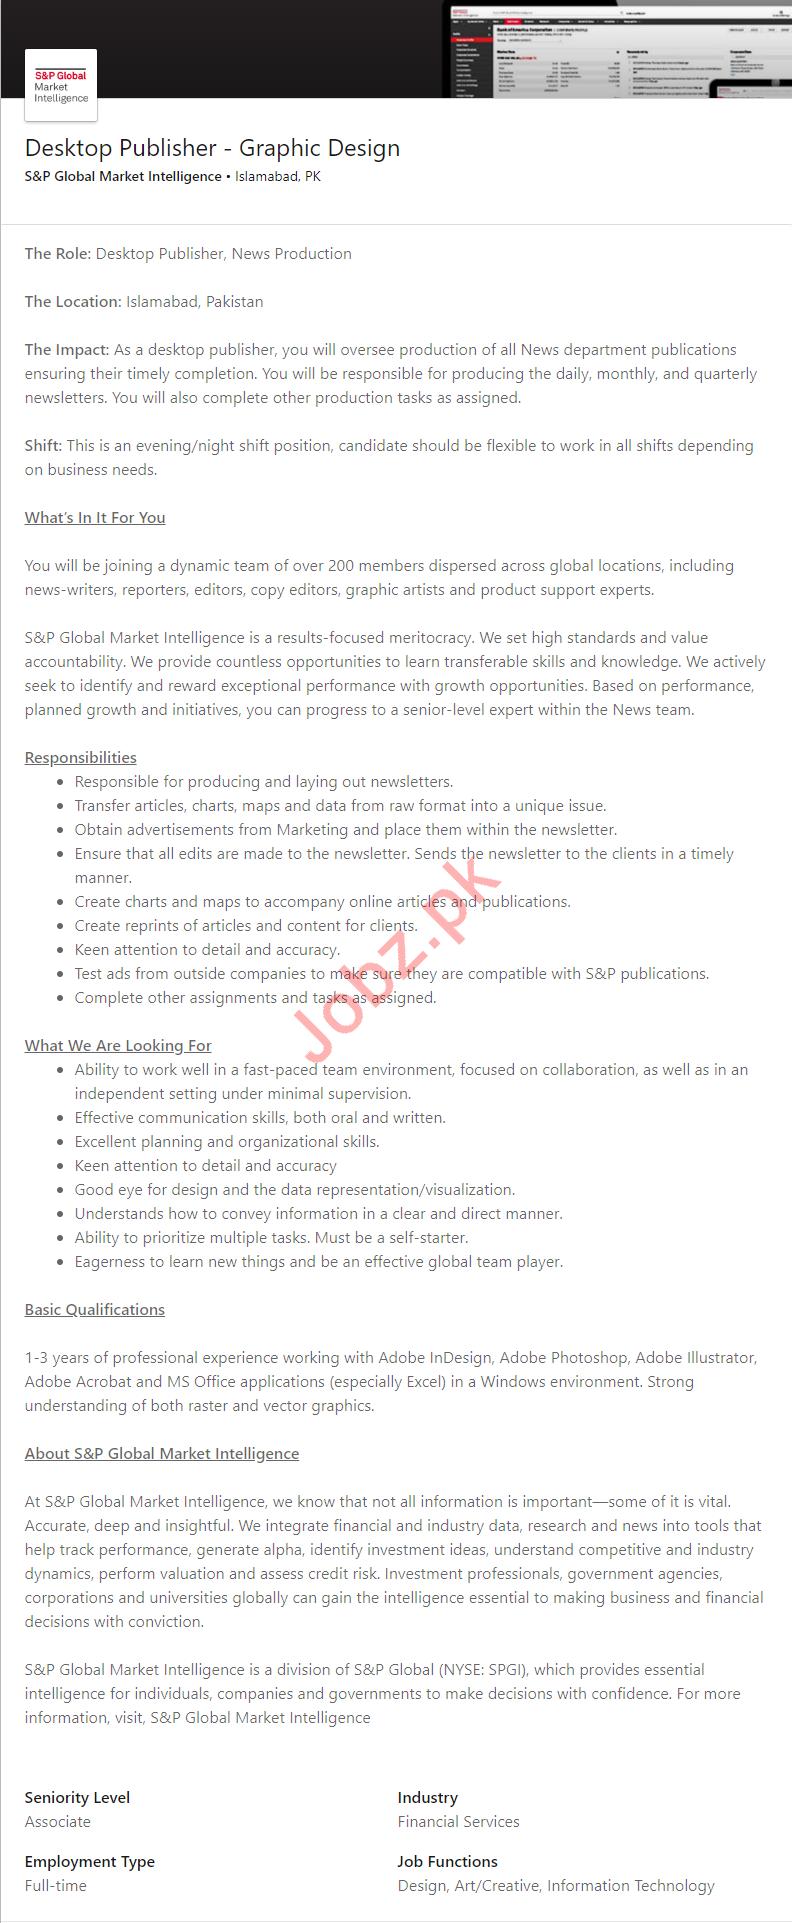 S&P Global Market Islamabad Jobs for Desktop Publisher